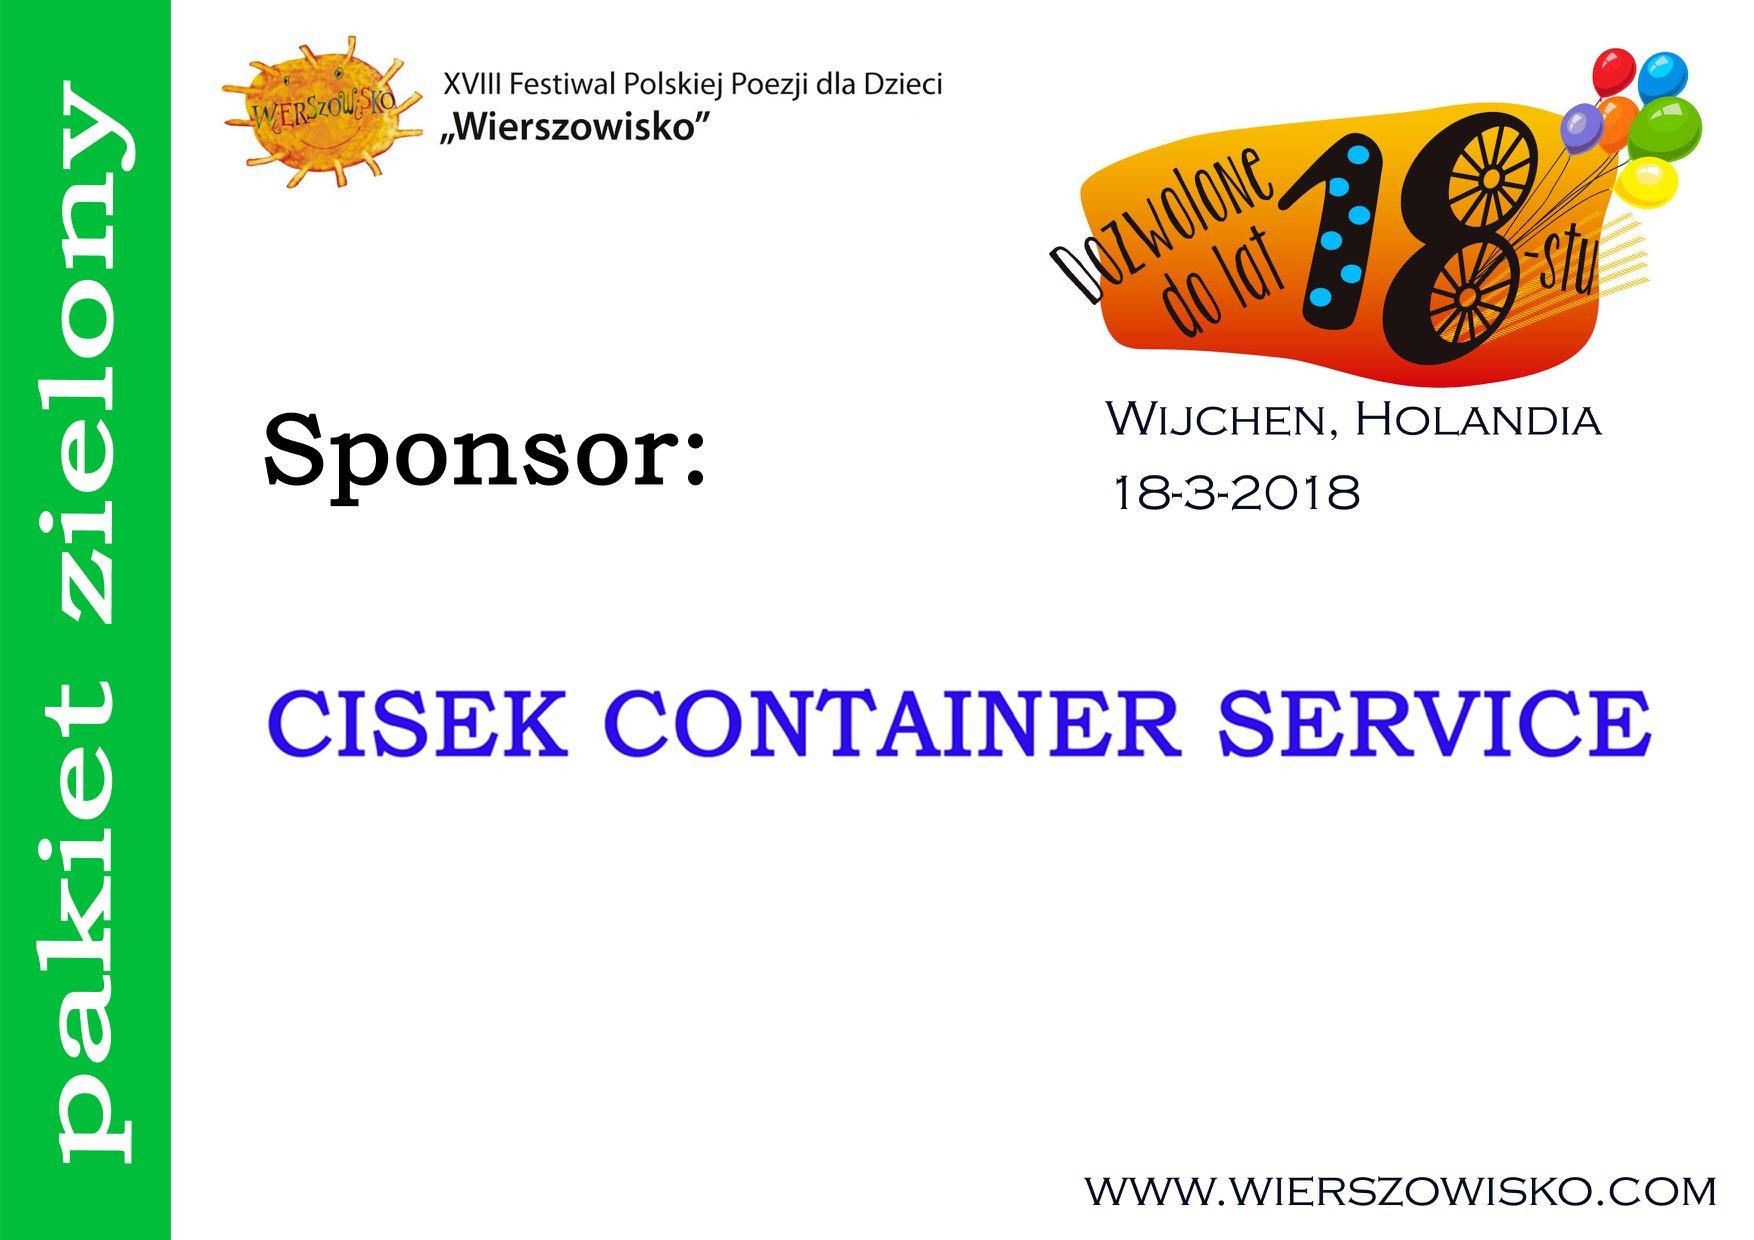 Cisek Container